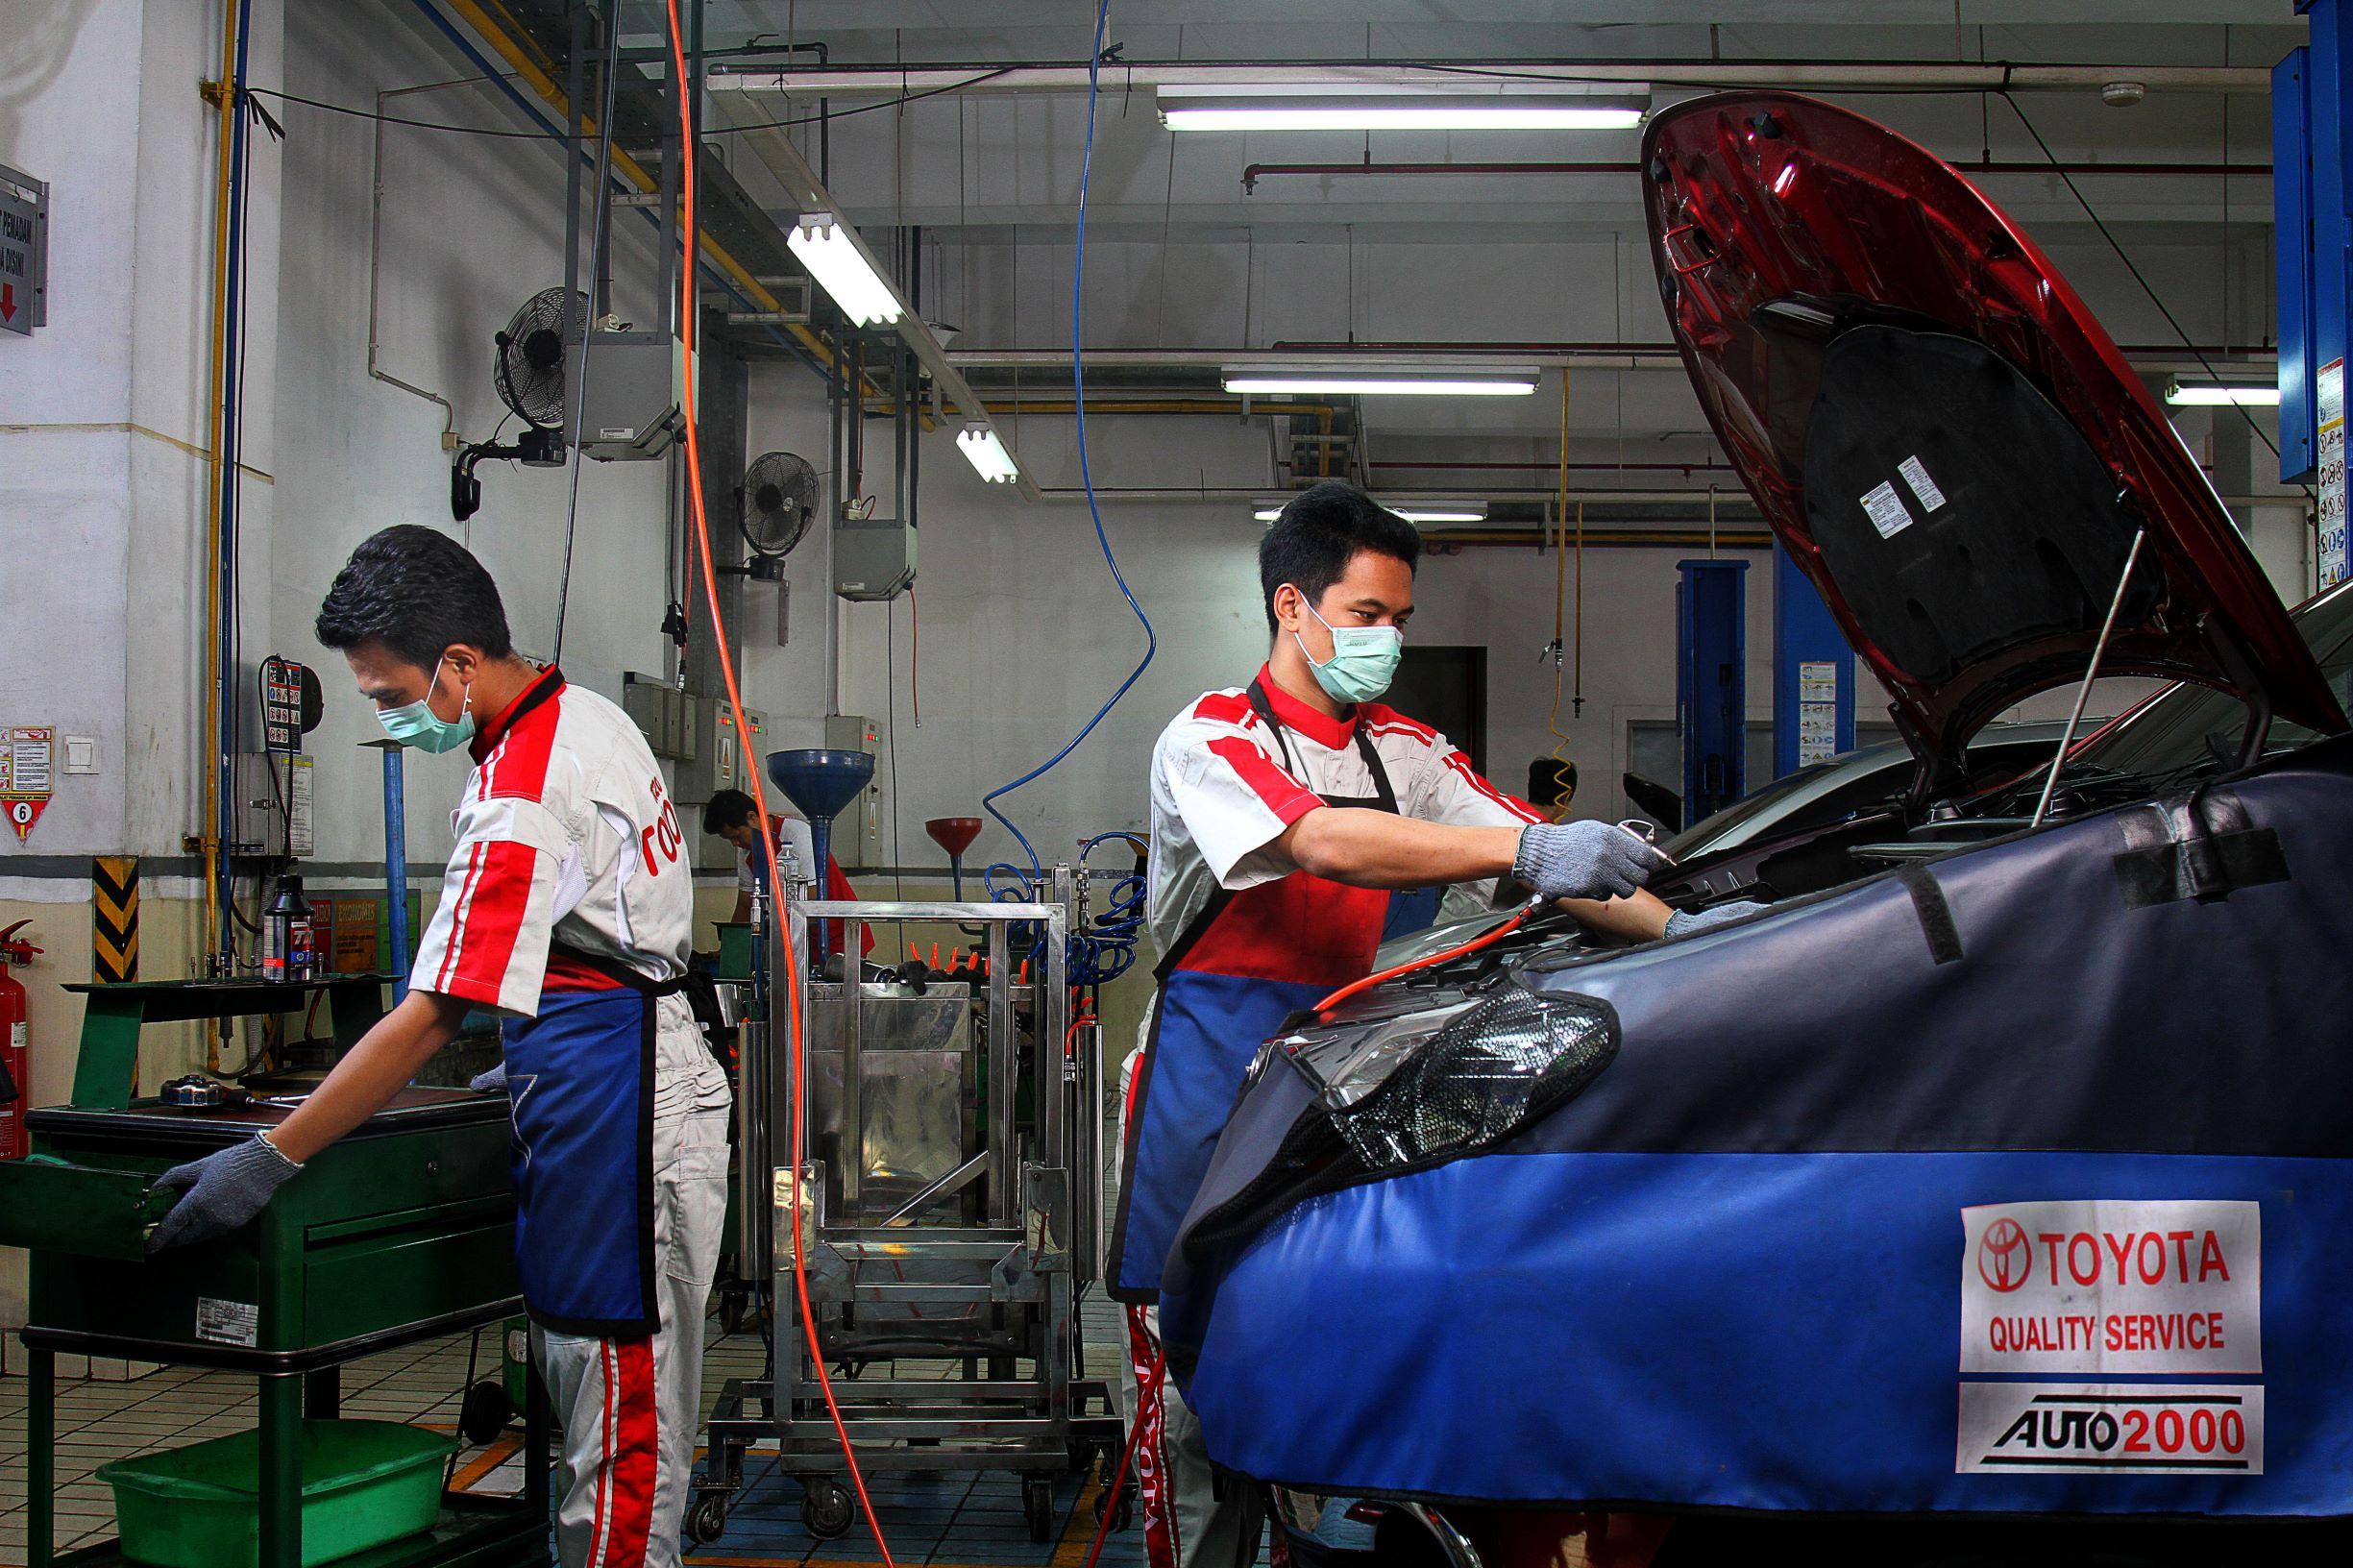 Auto2000 Siapkan Program Promo Hadapi New Normal